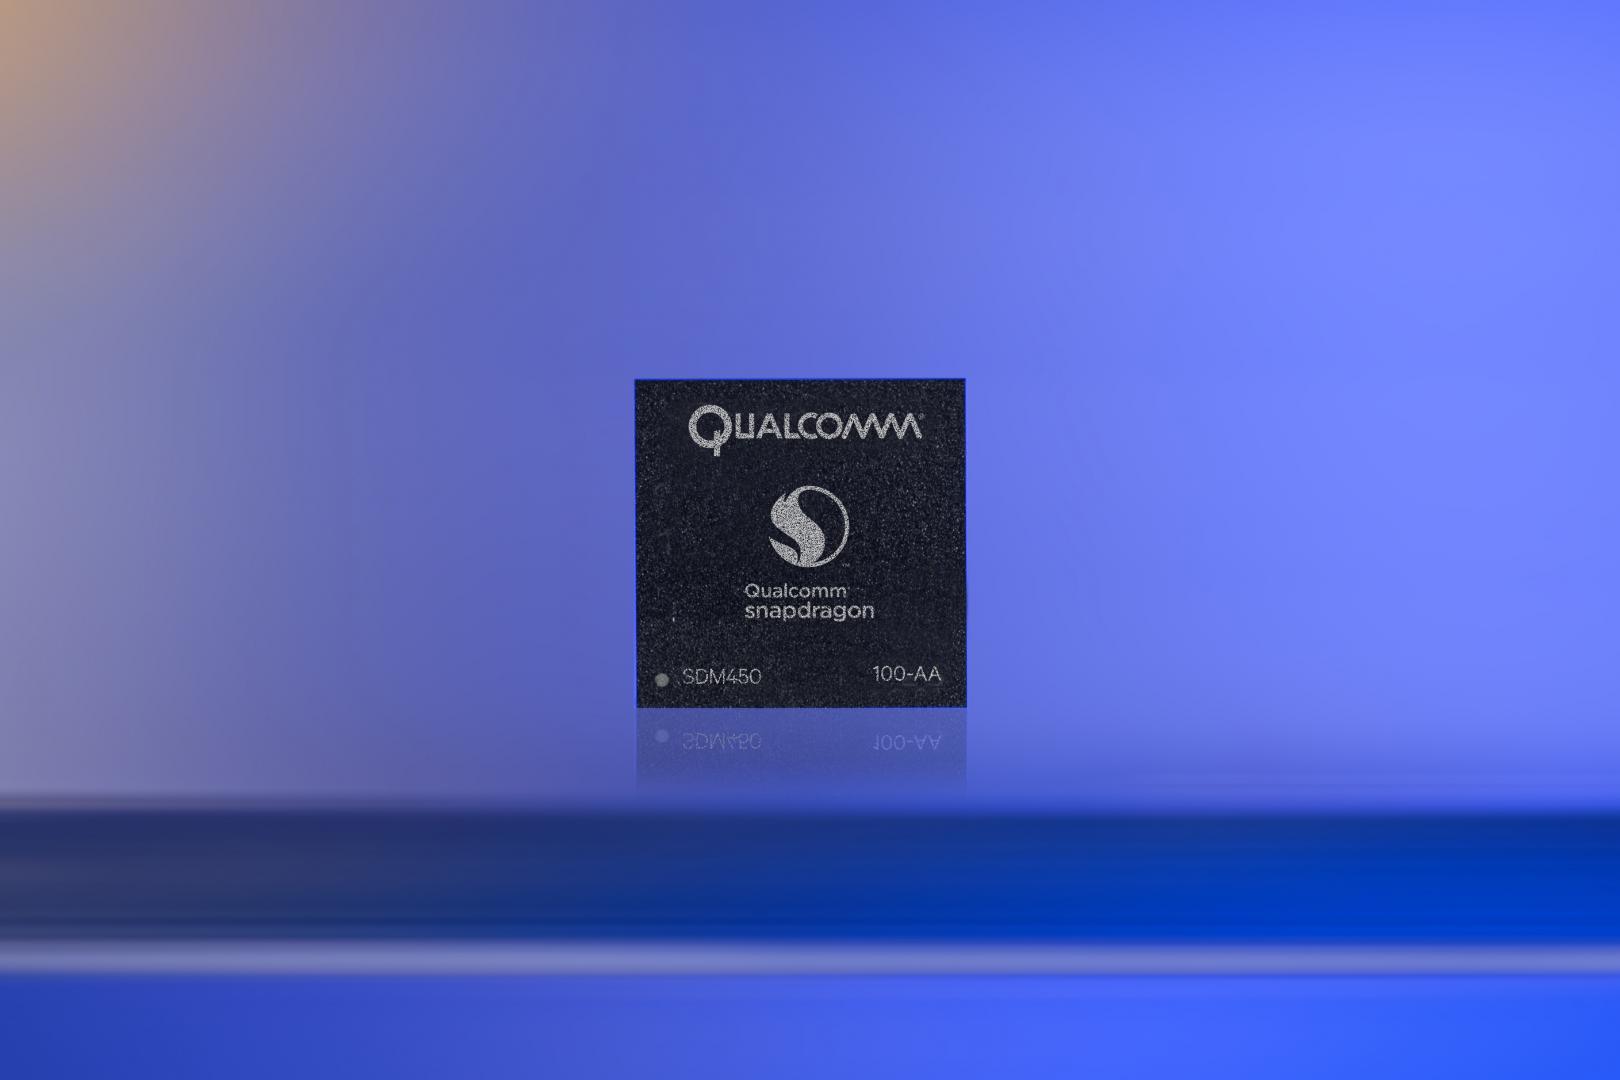 A Qualcomm chip.